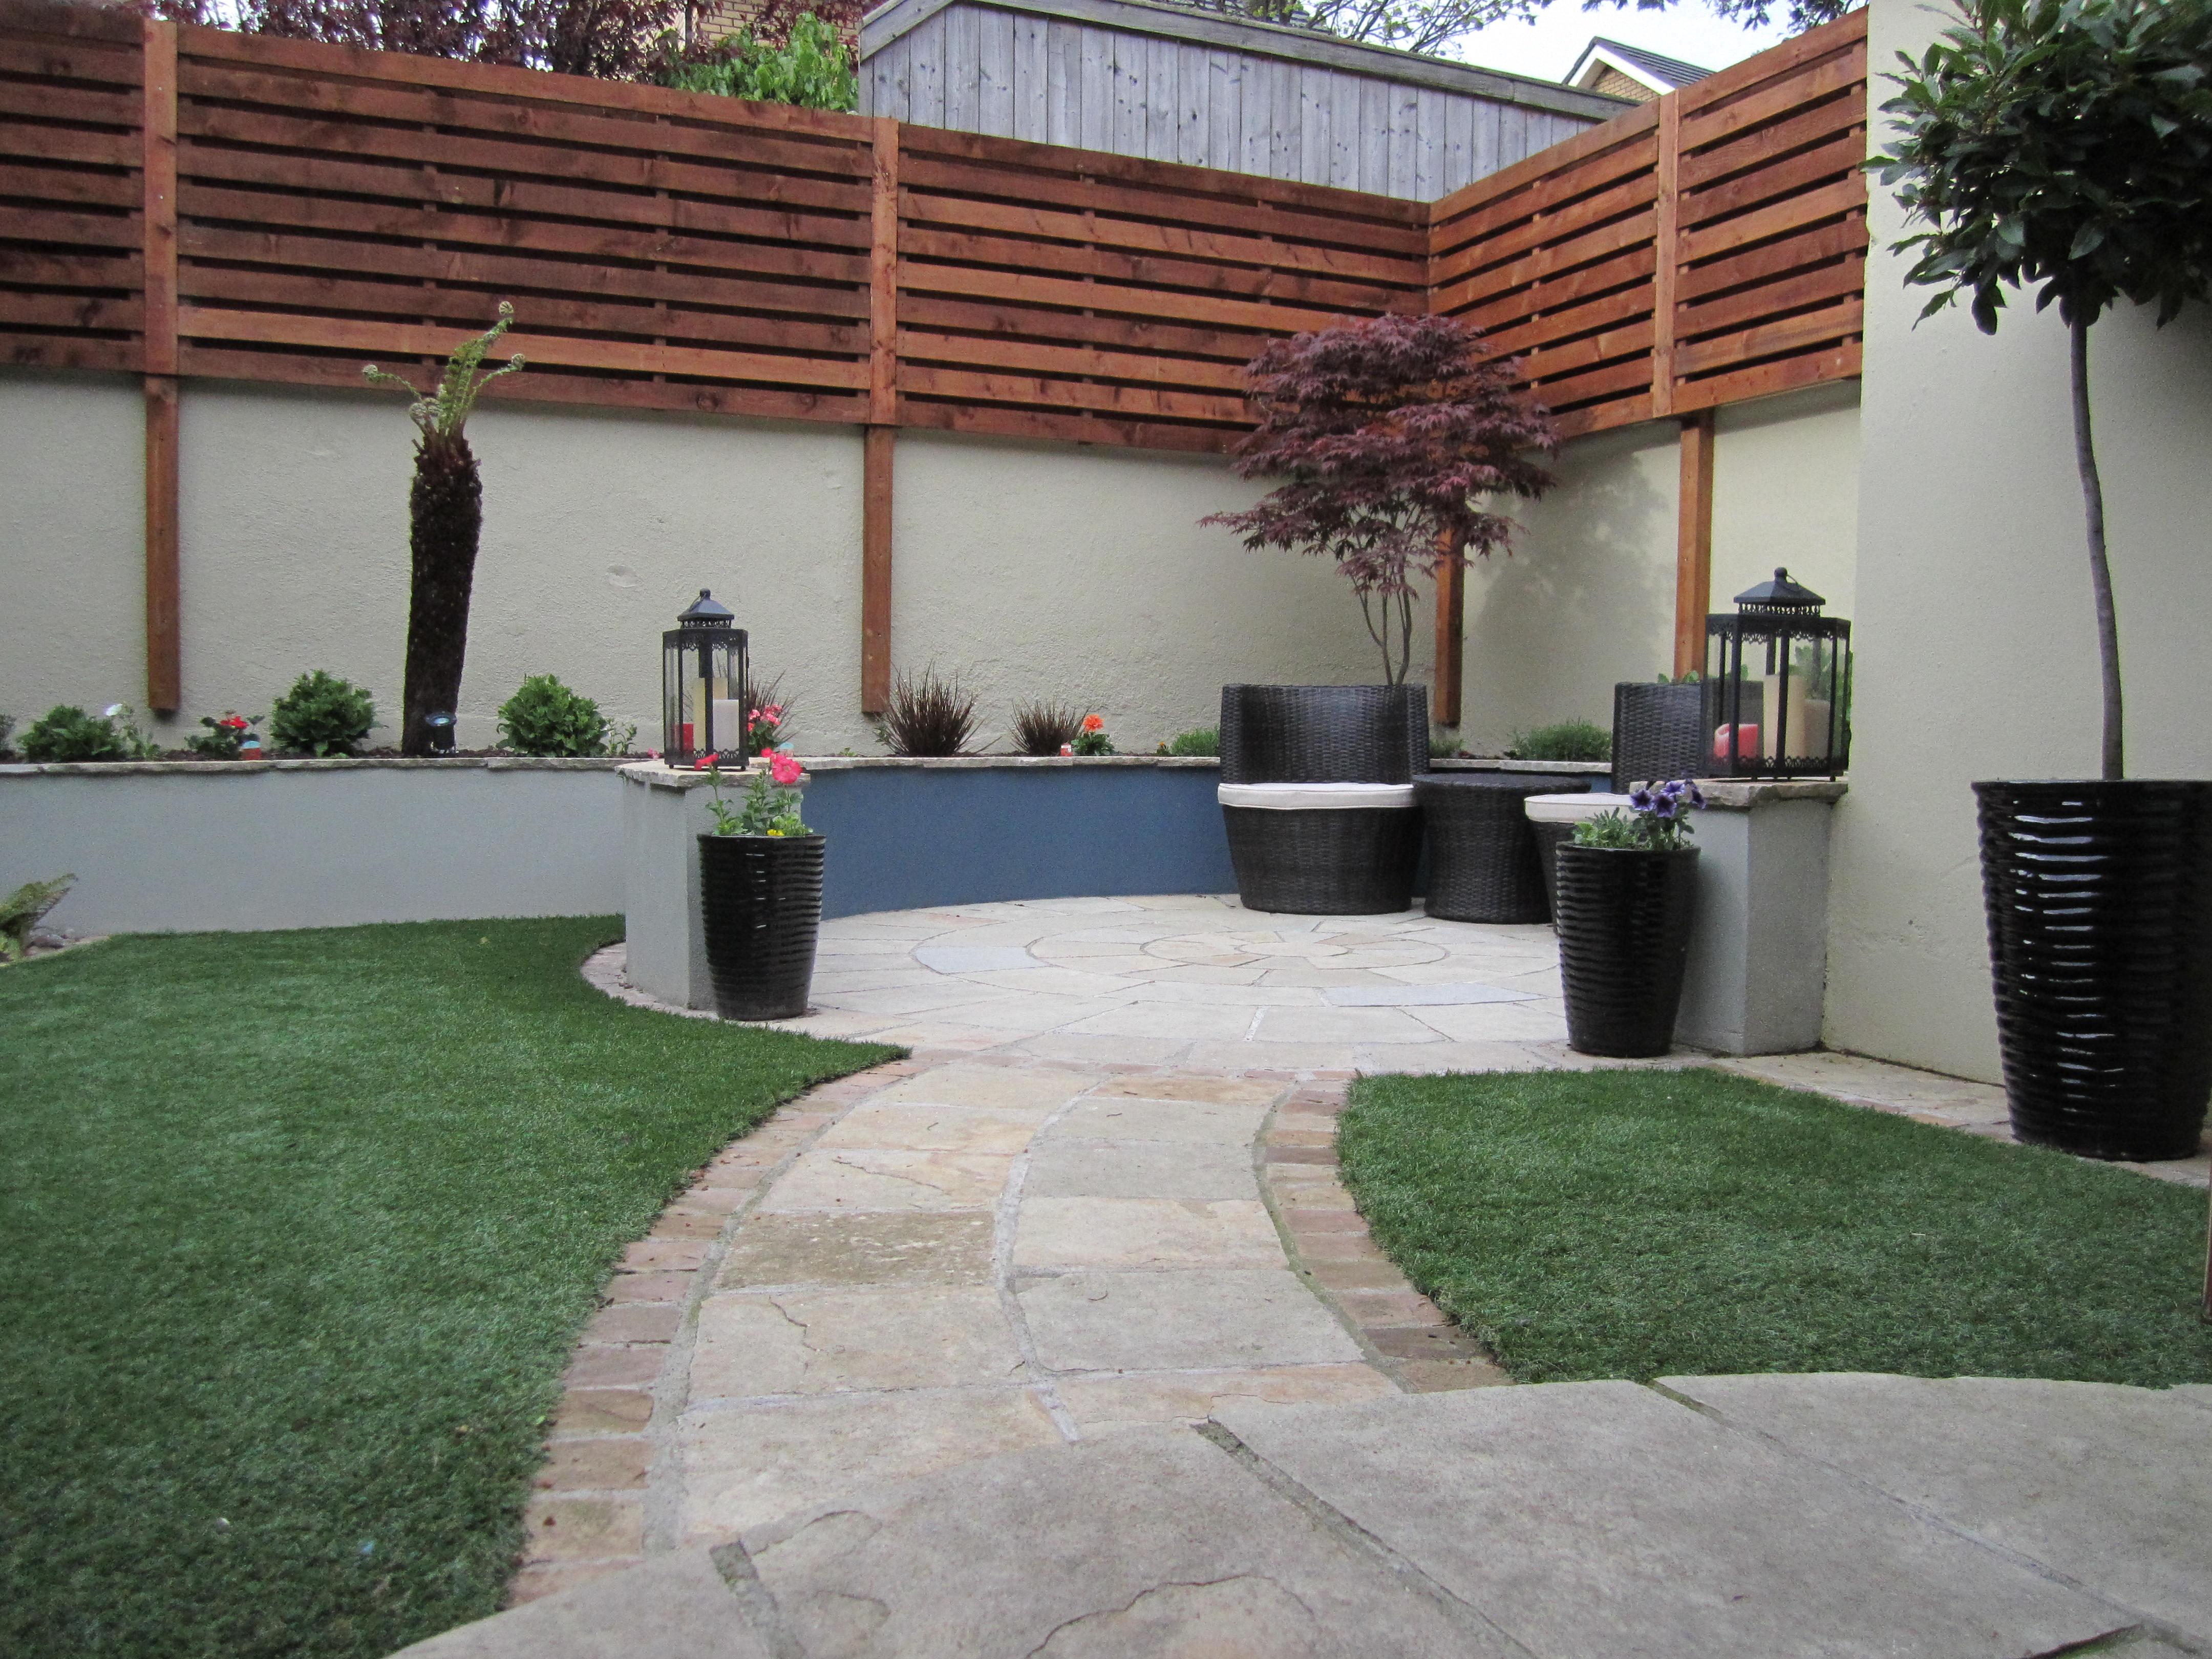 Garden Ideas Dublin patios and paving dublin & wicklow - landscaping.ie